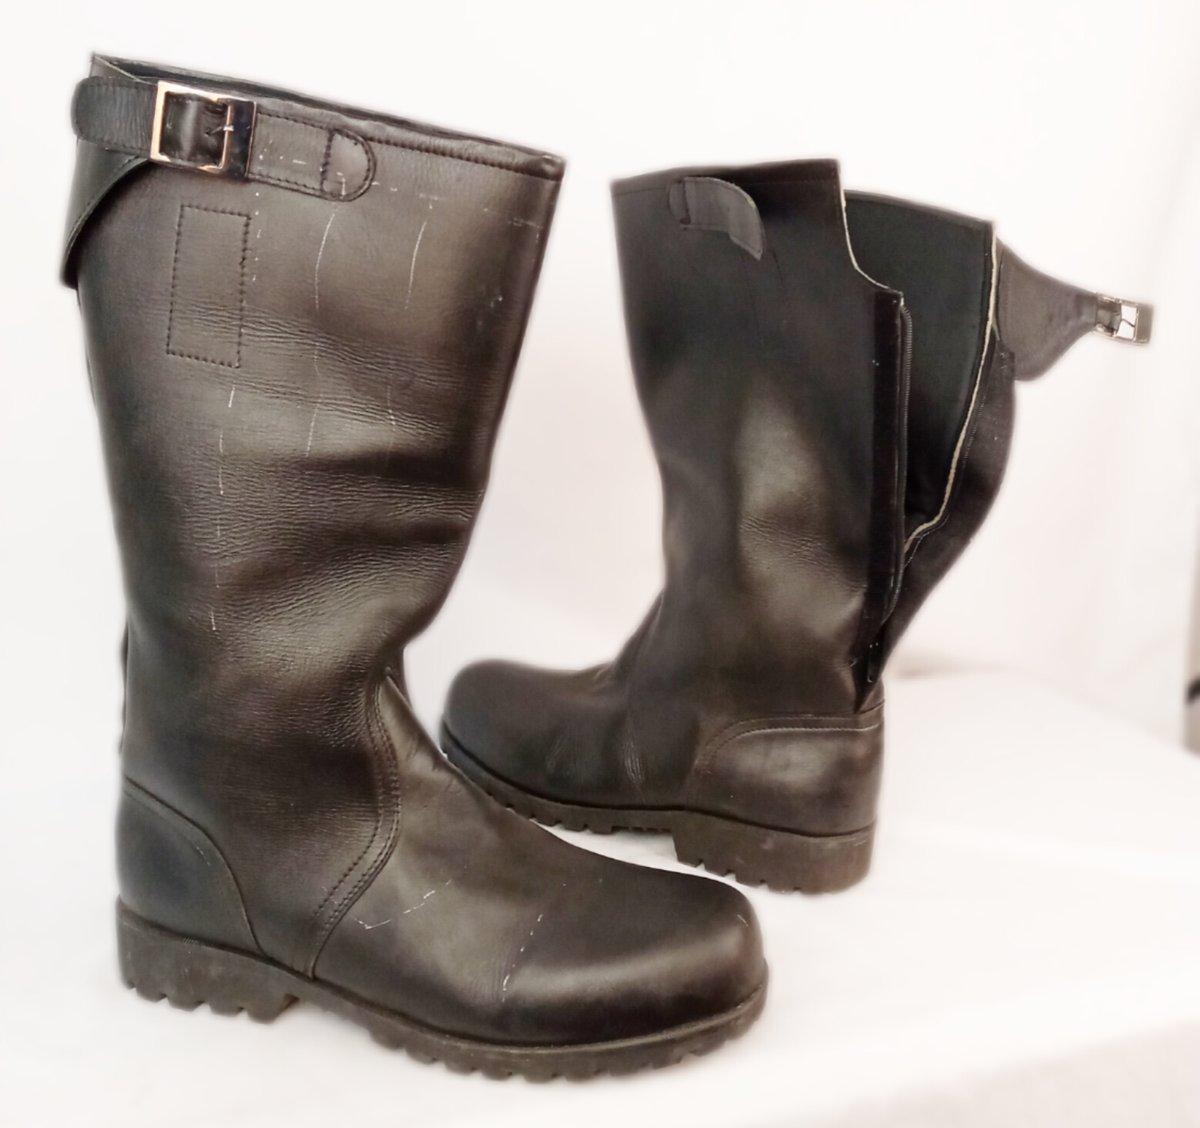 Image of #22 - B Grade from Stock - Shoe Size EU 48